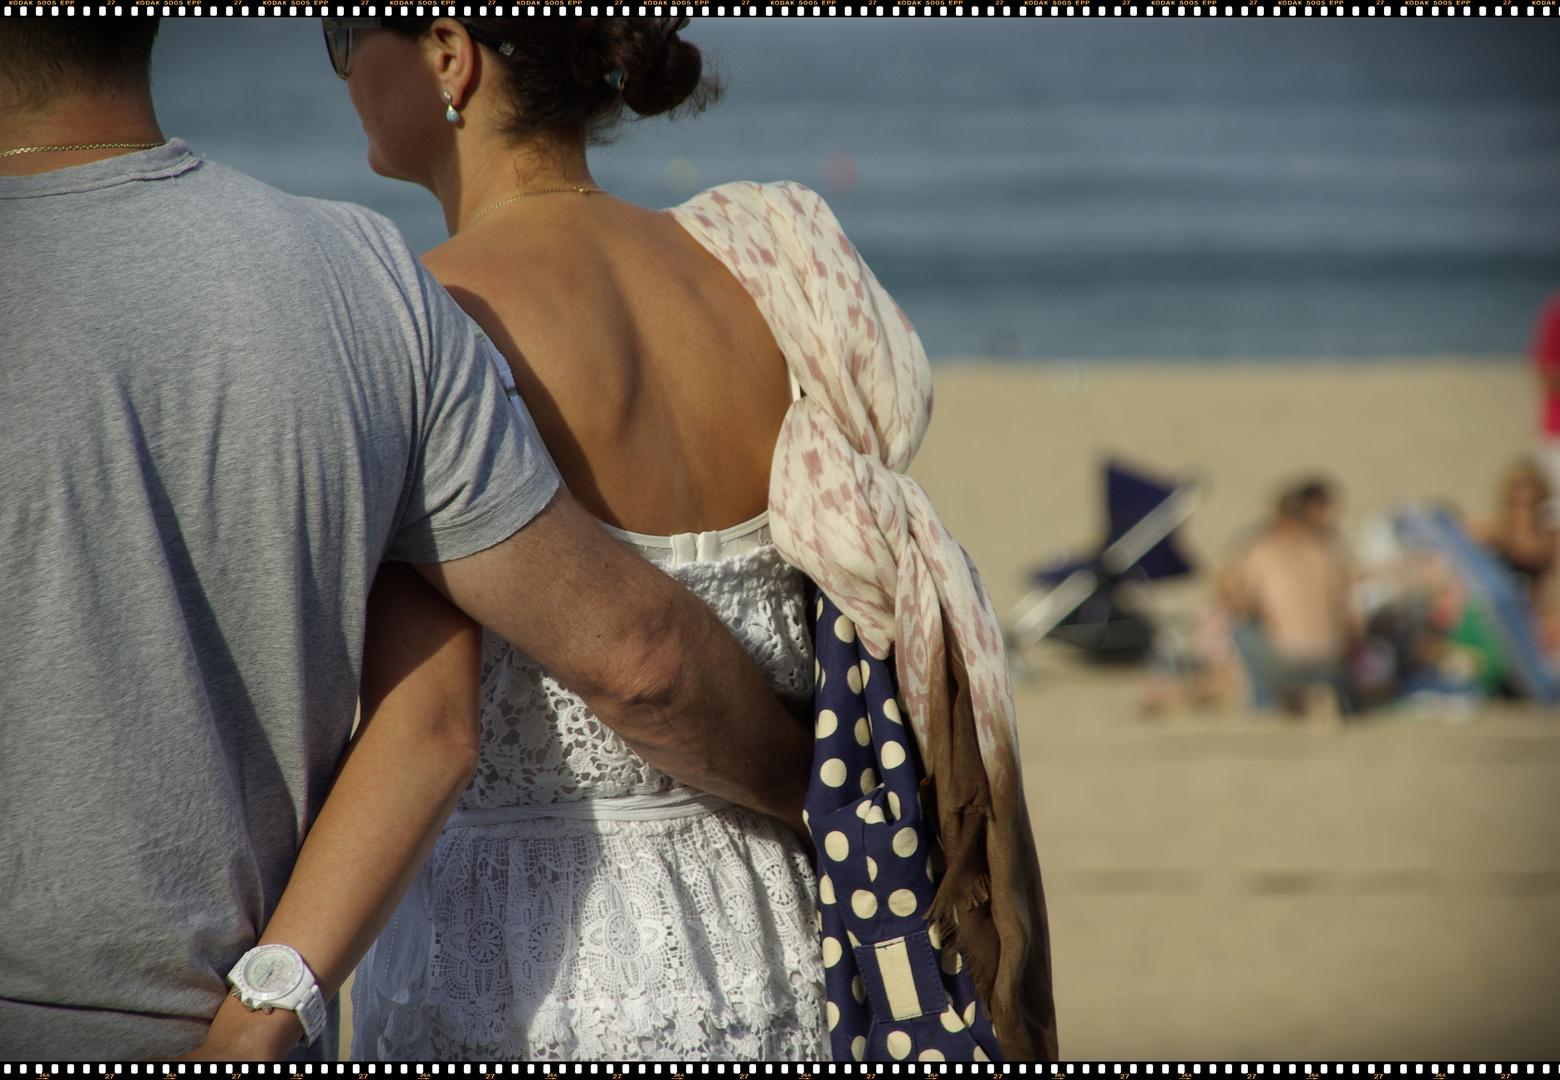 la prima de Riesgo paseando por la playa con su novio